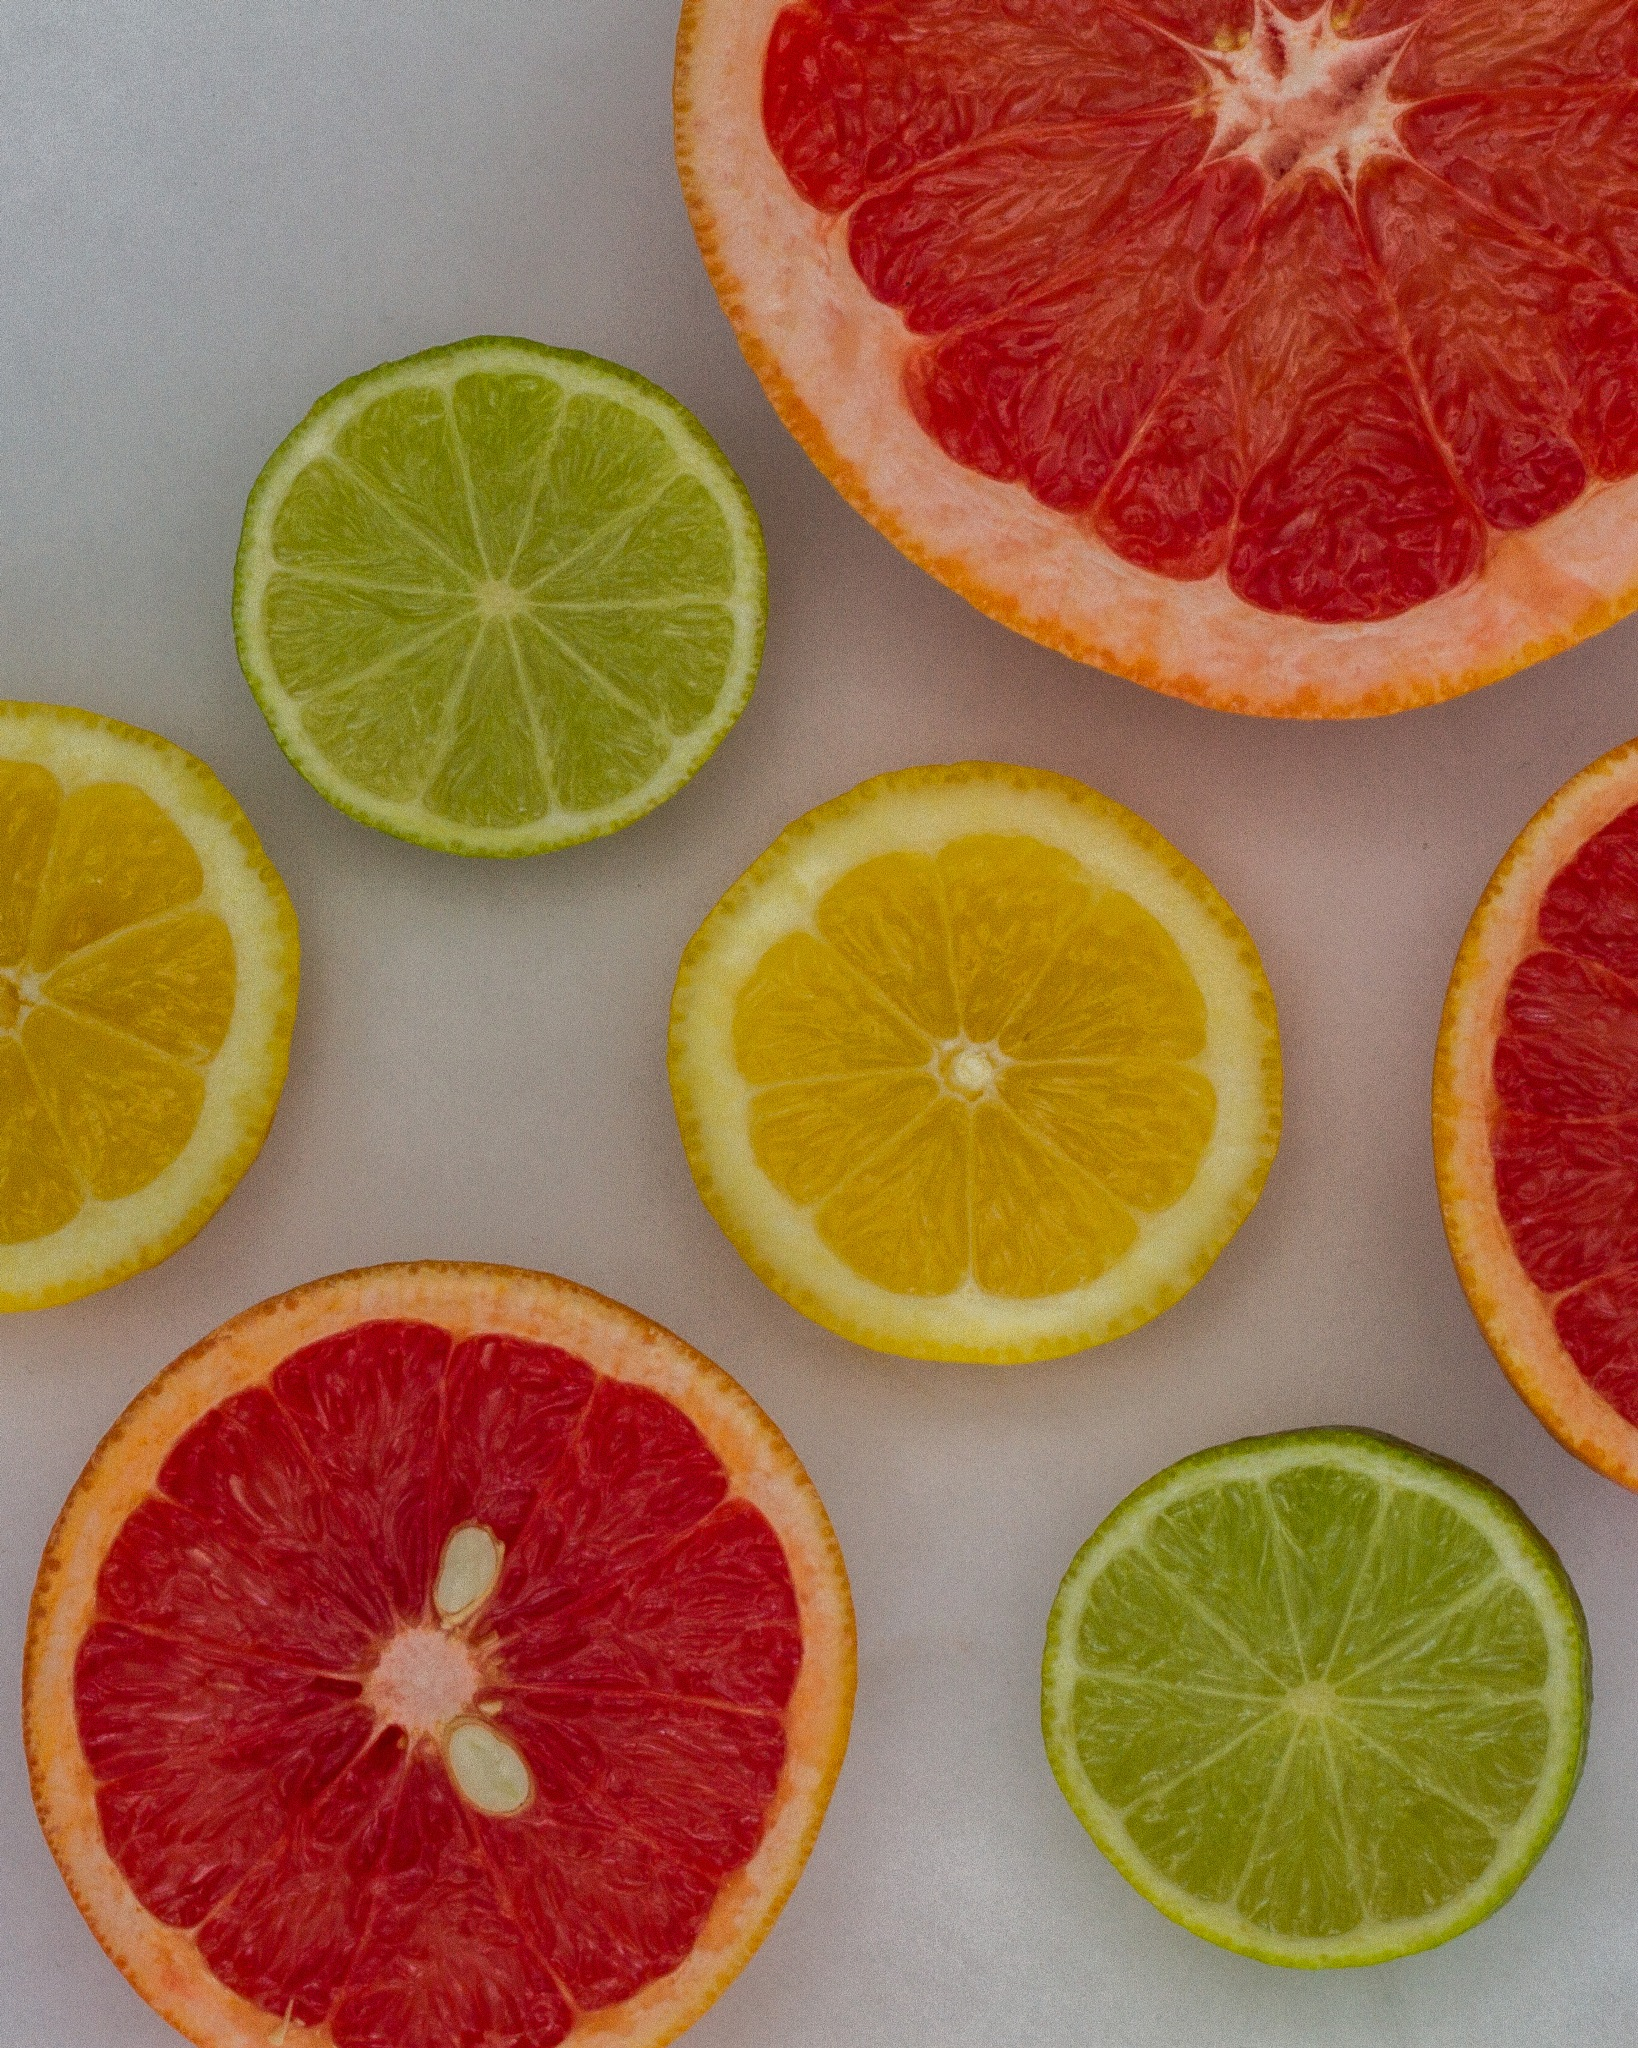 Citrus by Mikkel Fredberg Lauritzen